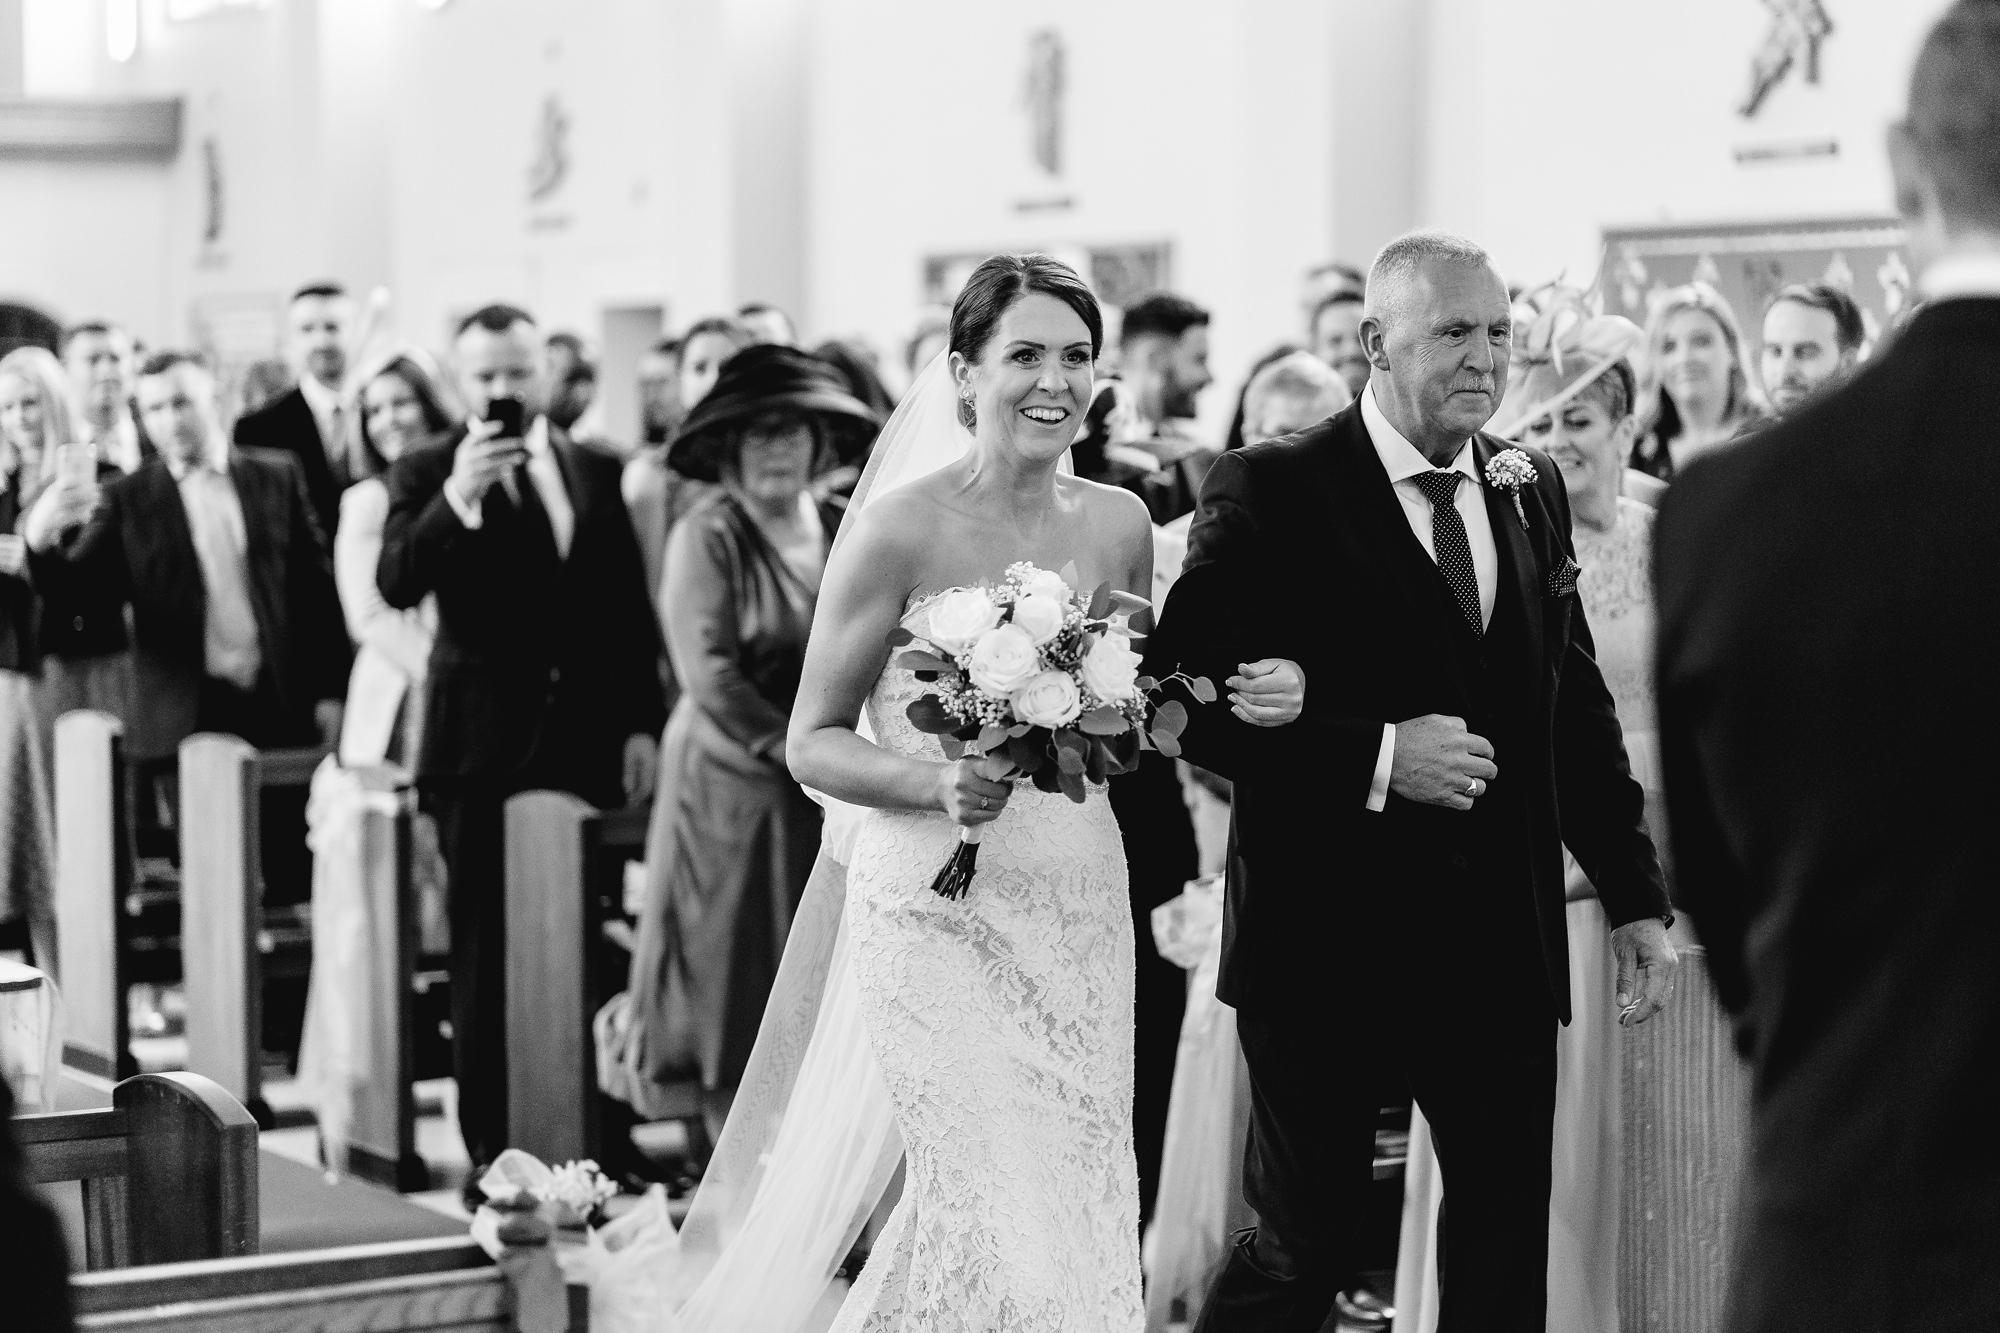 The-Castlefield-Rooms-Wedding-Photographer_0007.jpg